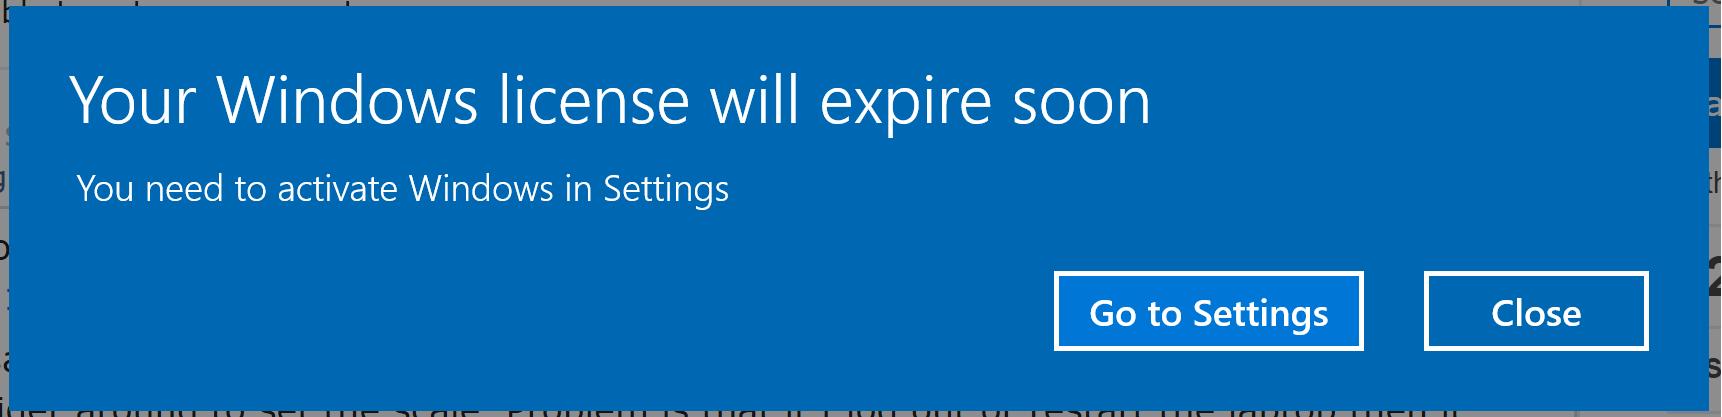 windows-licence-expire-soon-windows-10